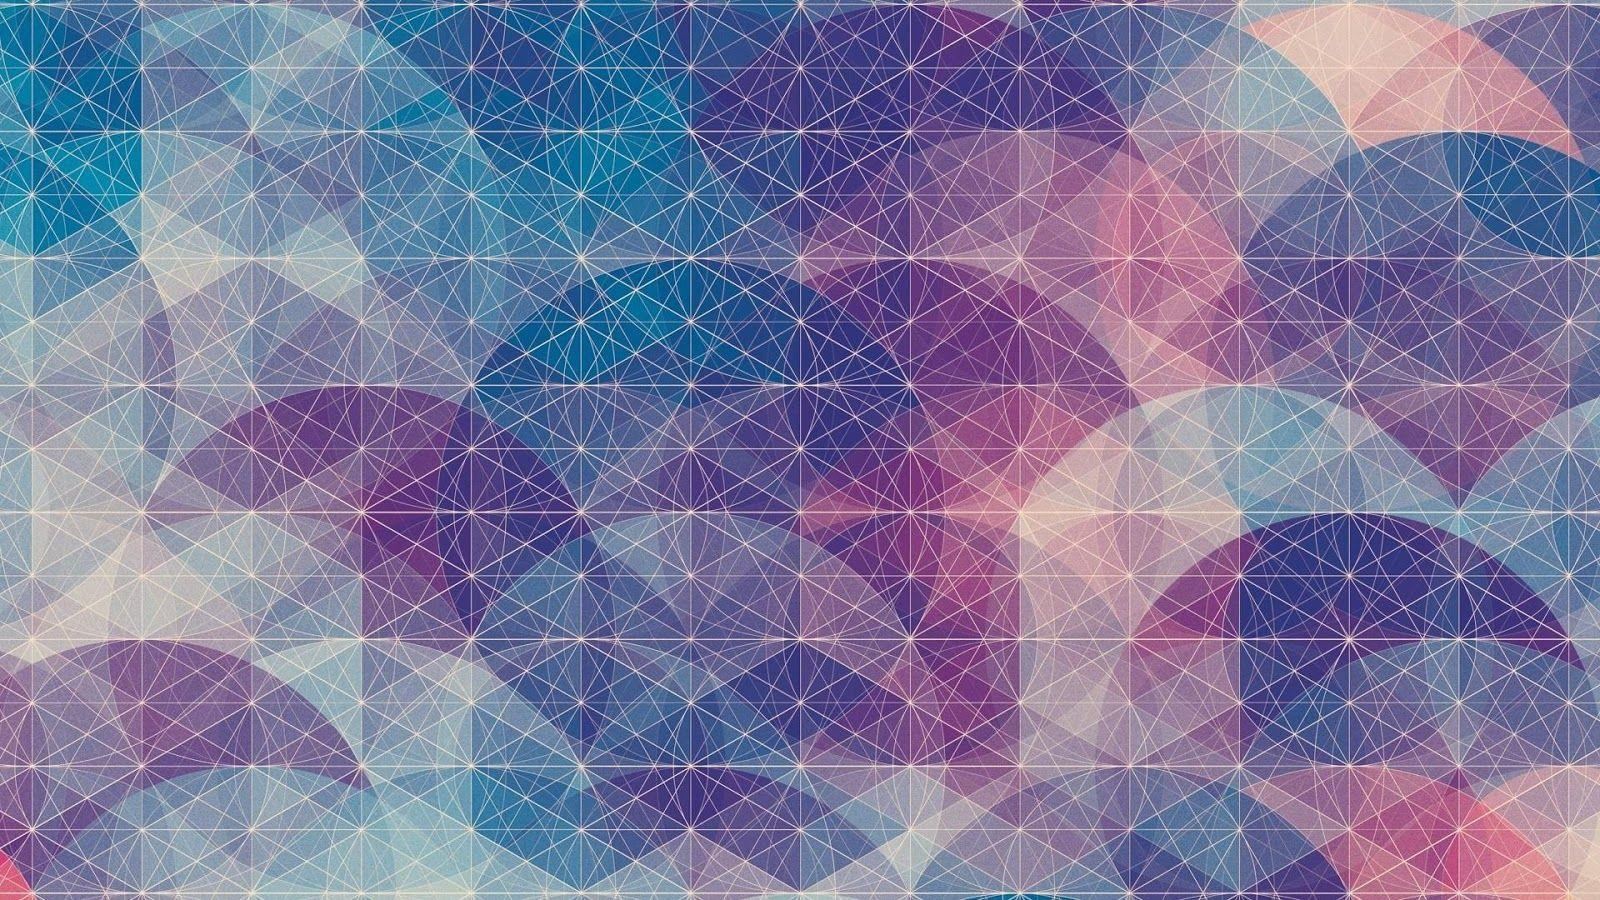 Abstract Geometric Wallpapers - WallpaperSafari